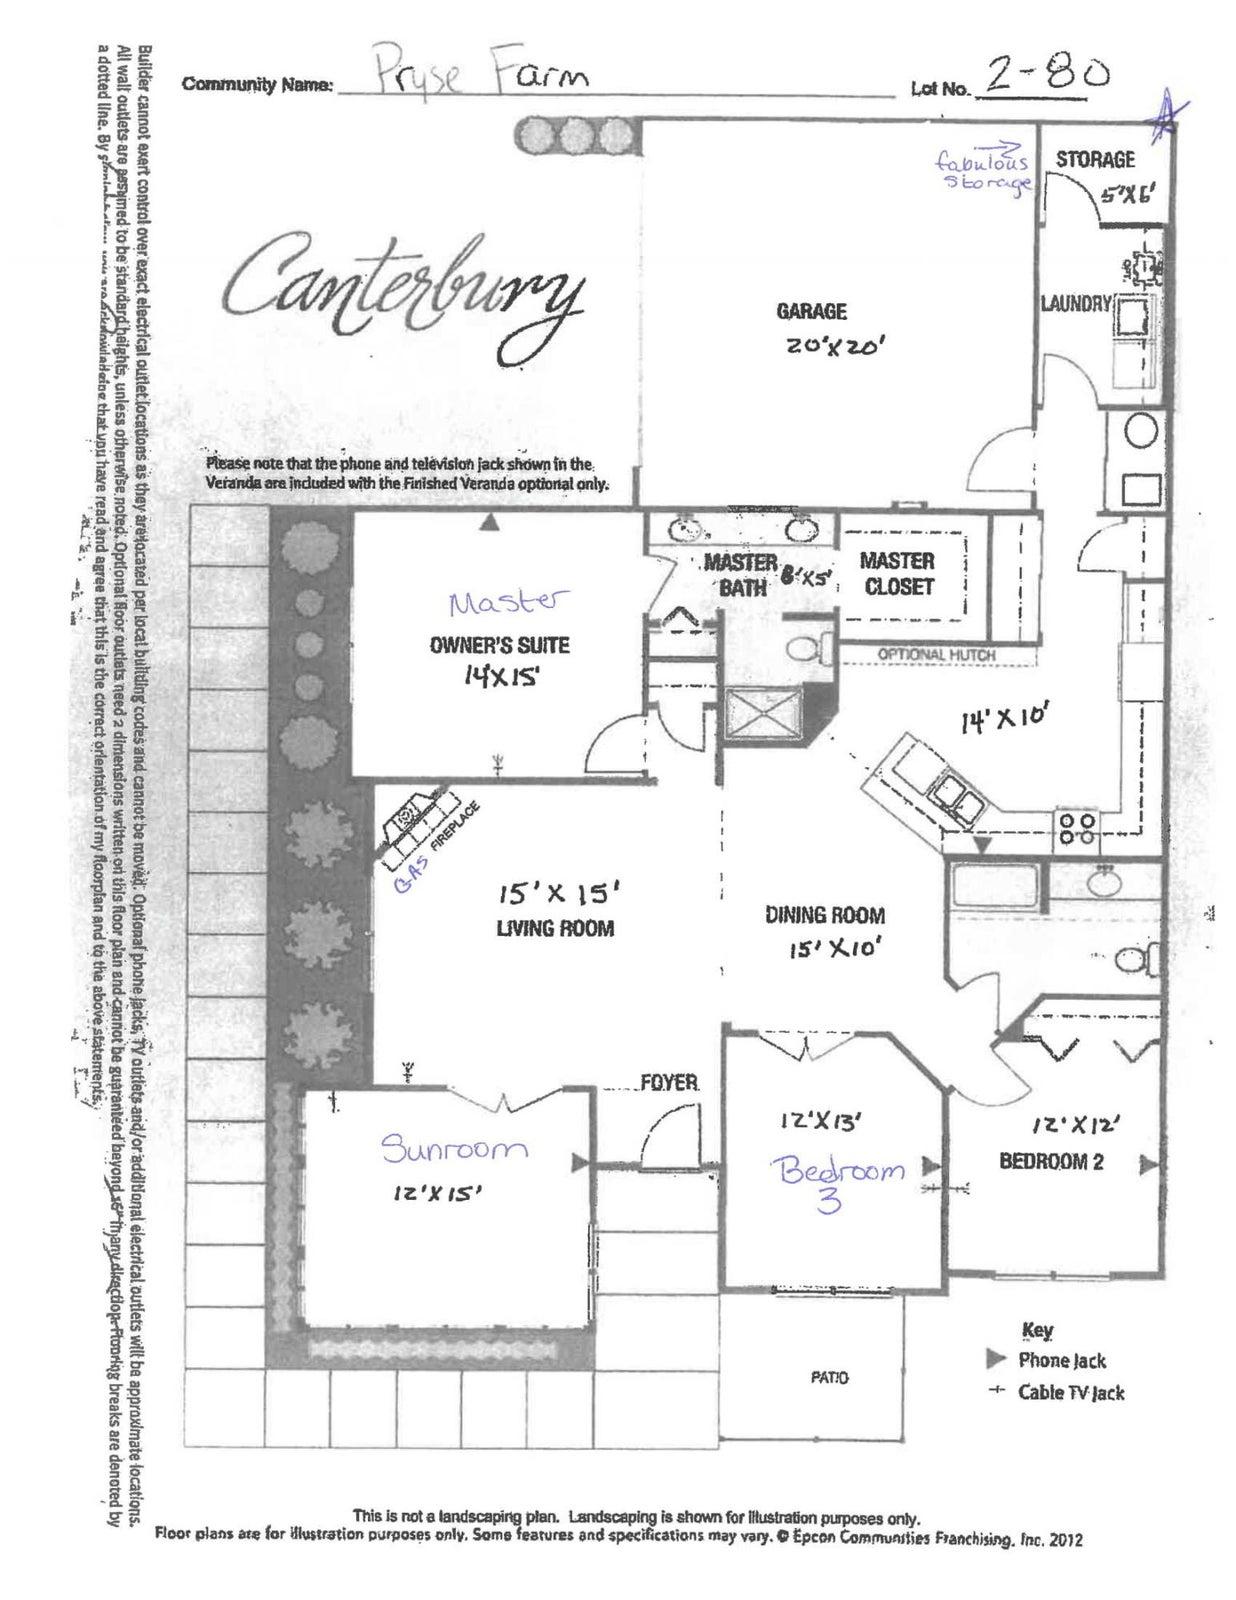 809 Pryse Farm floor plan (1)-1